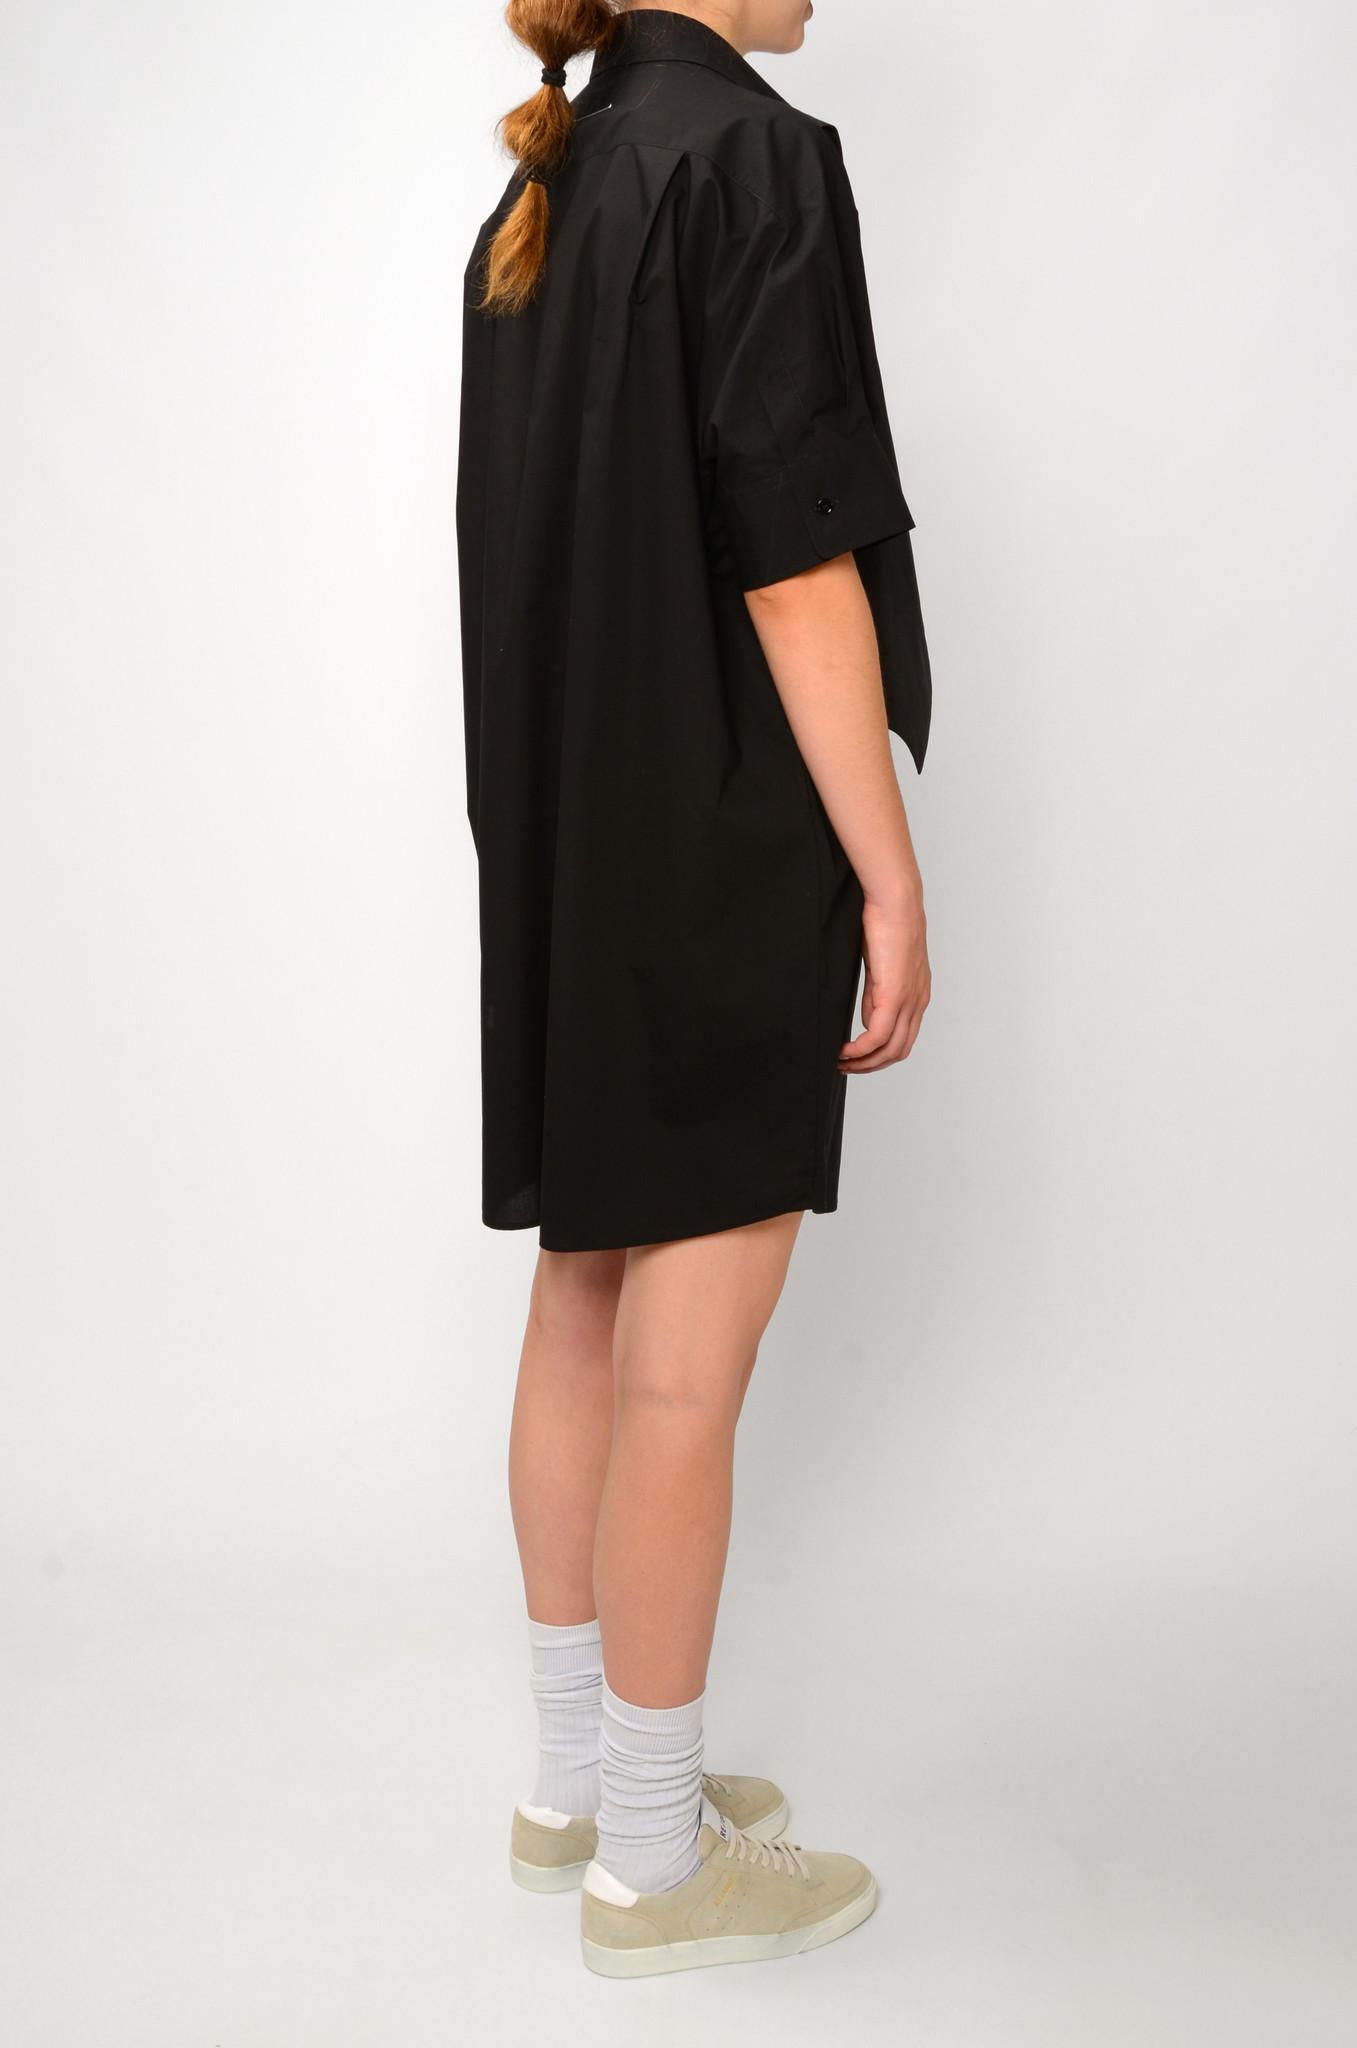 WAISTCOAT SHIRT DRESS IN BLACK-4